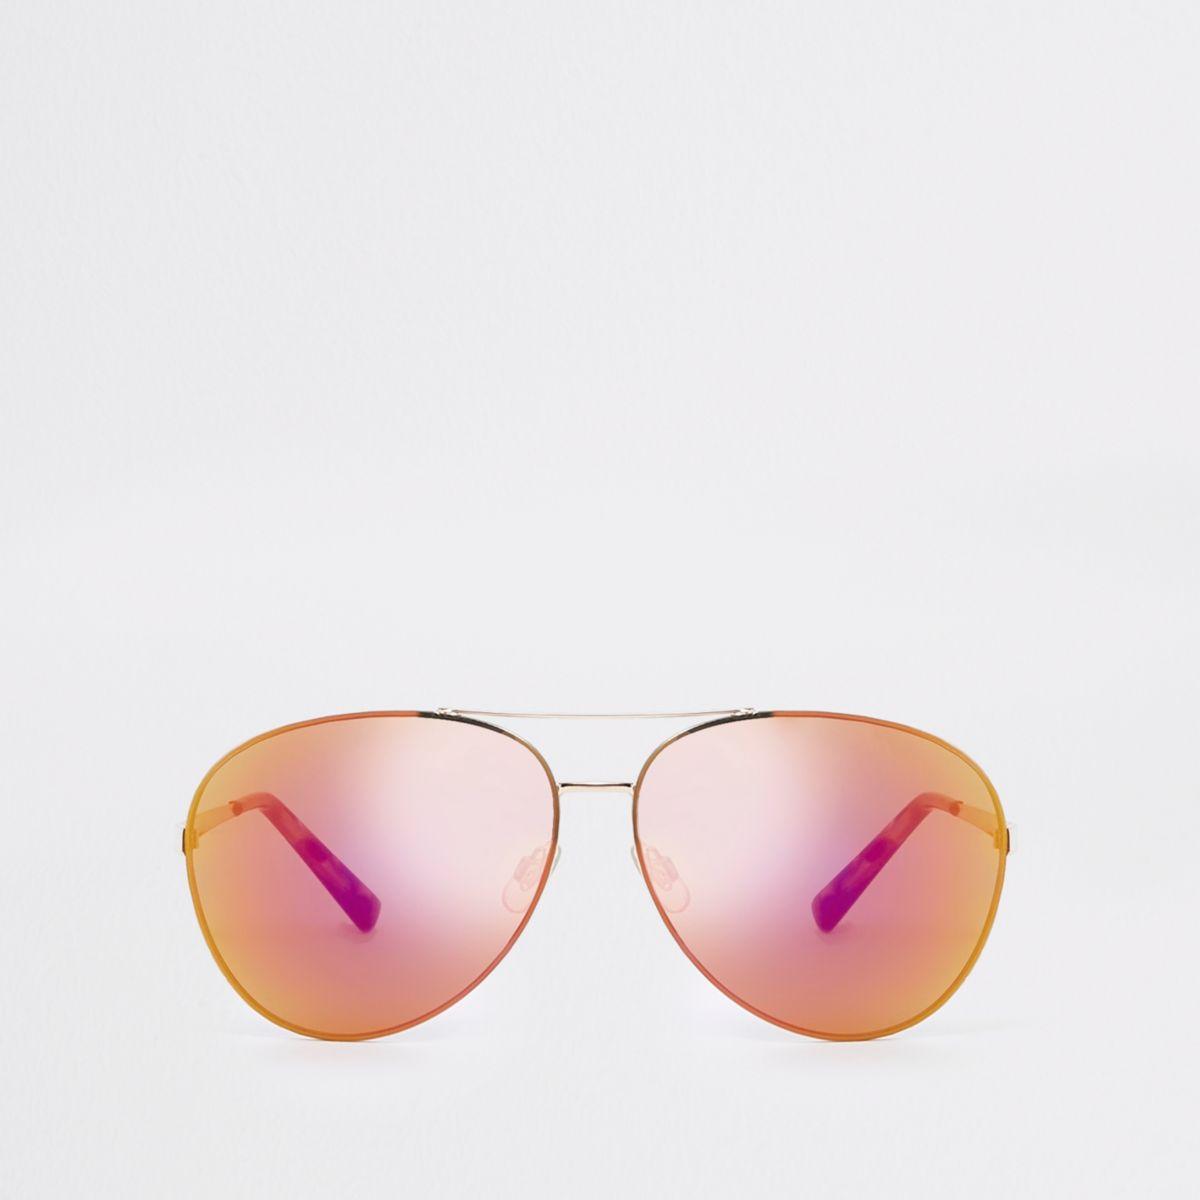 Gold tone red lens aviator sunglasses